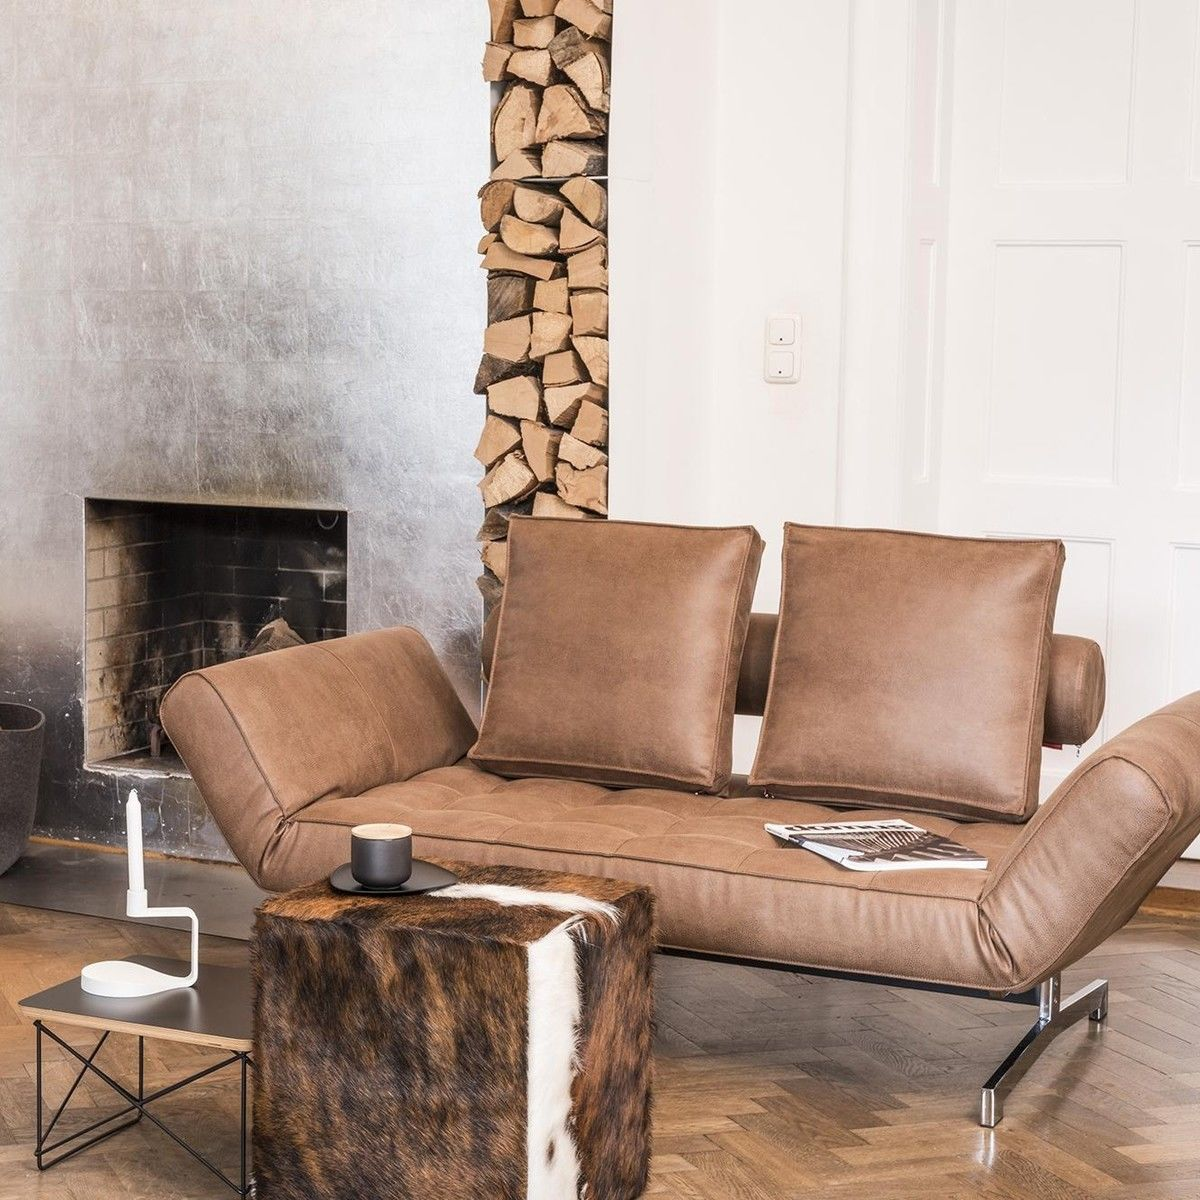 cheyenne fell hocker pouf jan kurtz. Black Bedroom Furniture Sets. Home Design Ideas